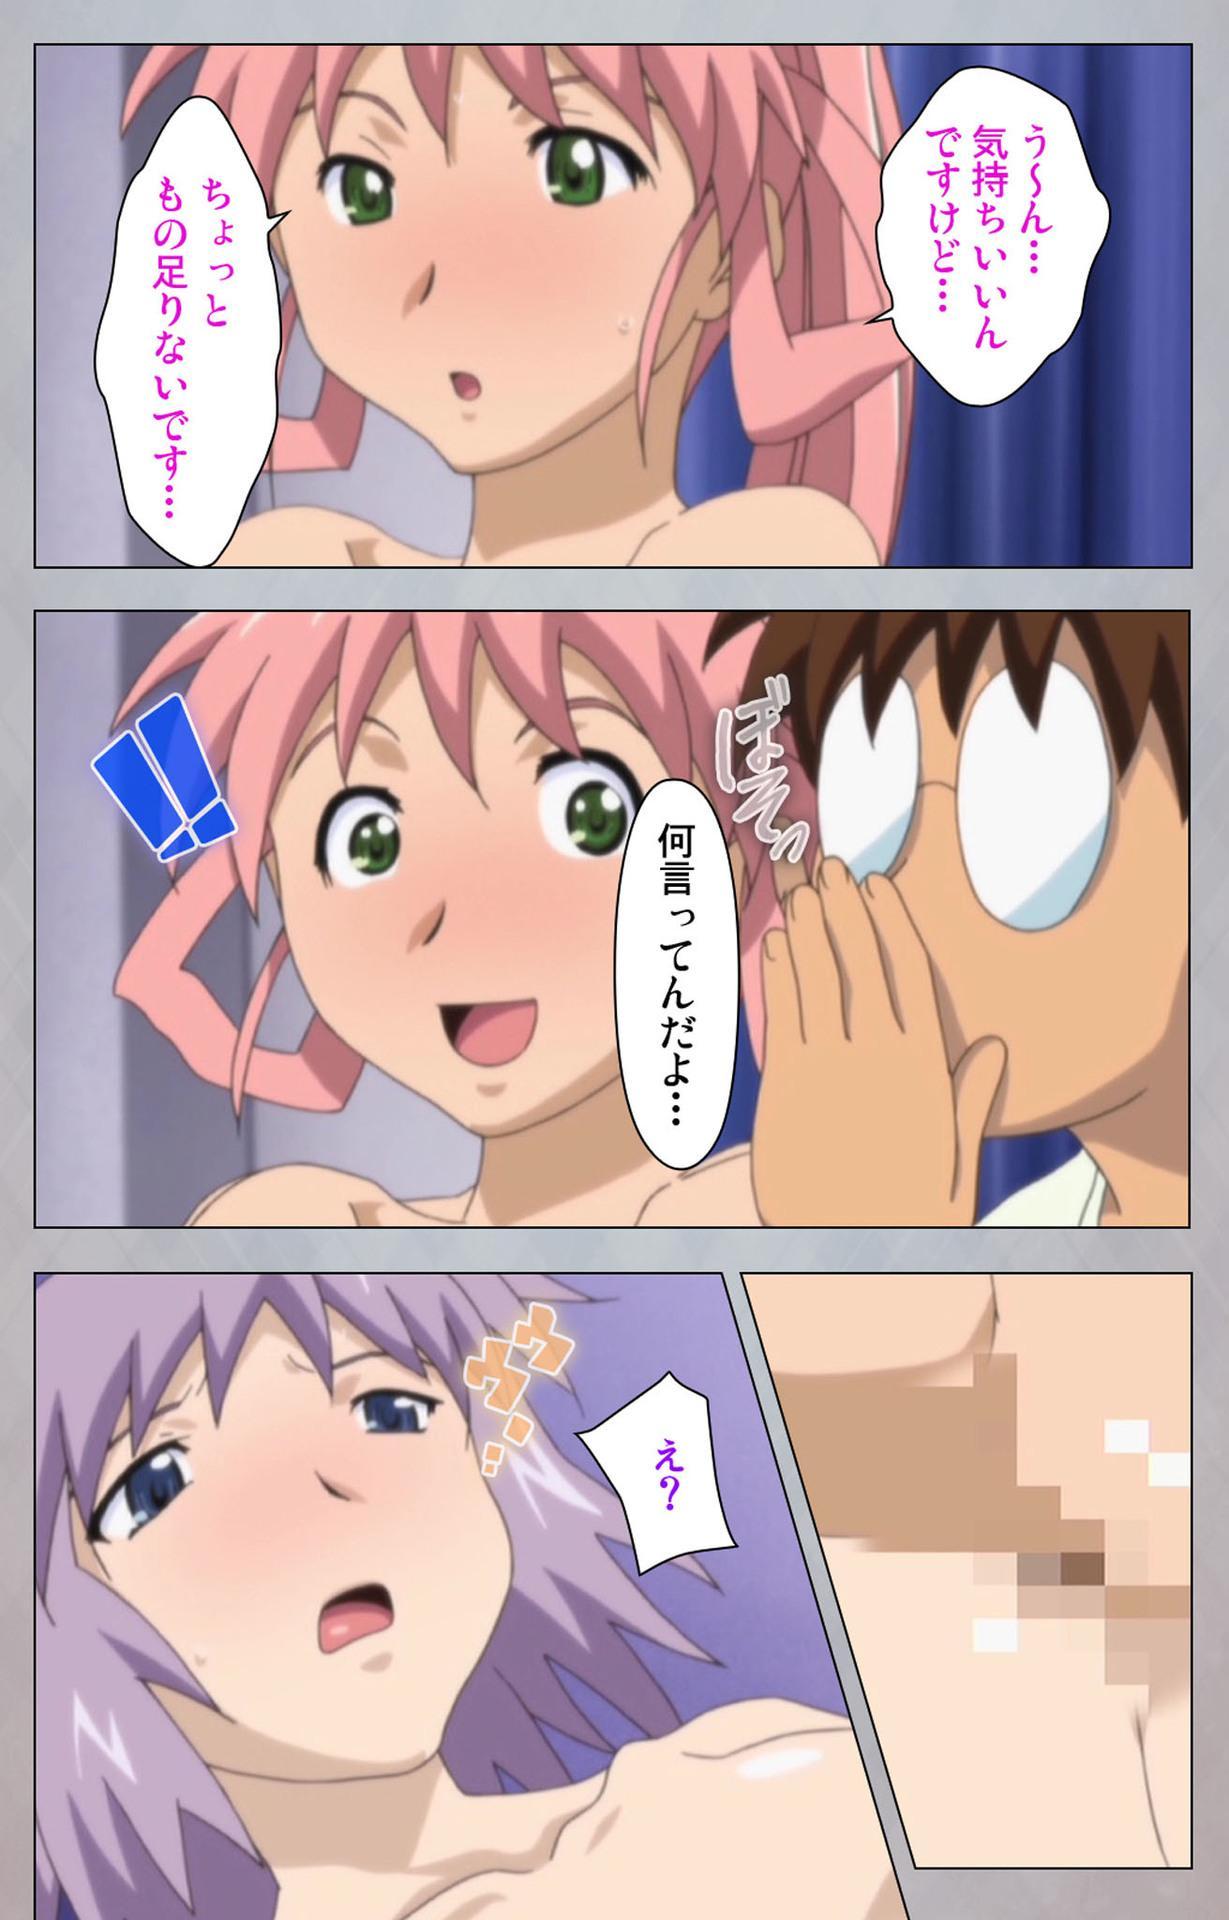 [Digital Works] [Full Color Seijin Ban] Sex Android ~Risou no Onna de Nuite yaru~ Kanzenban 214